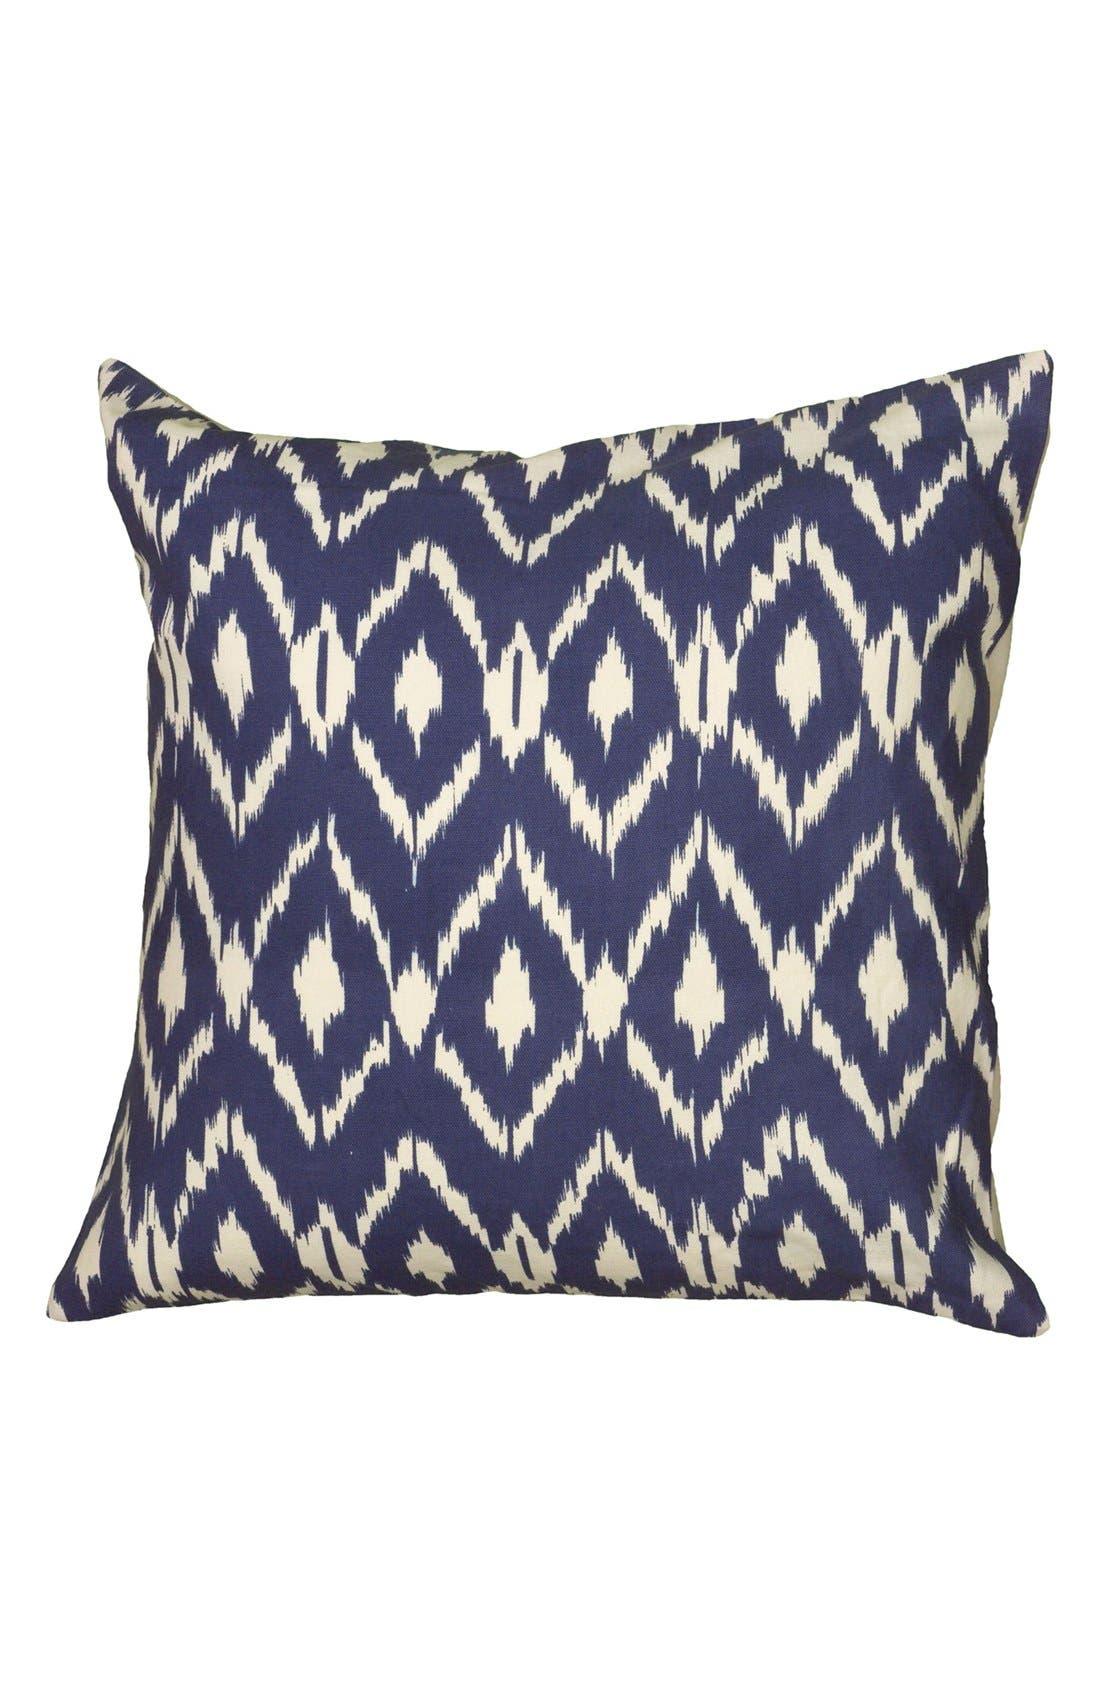 Ikat Pillow,                             Main thumbnail 1, color,                             Navy/ Blue